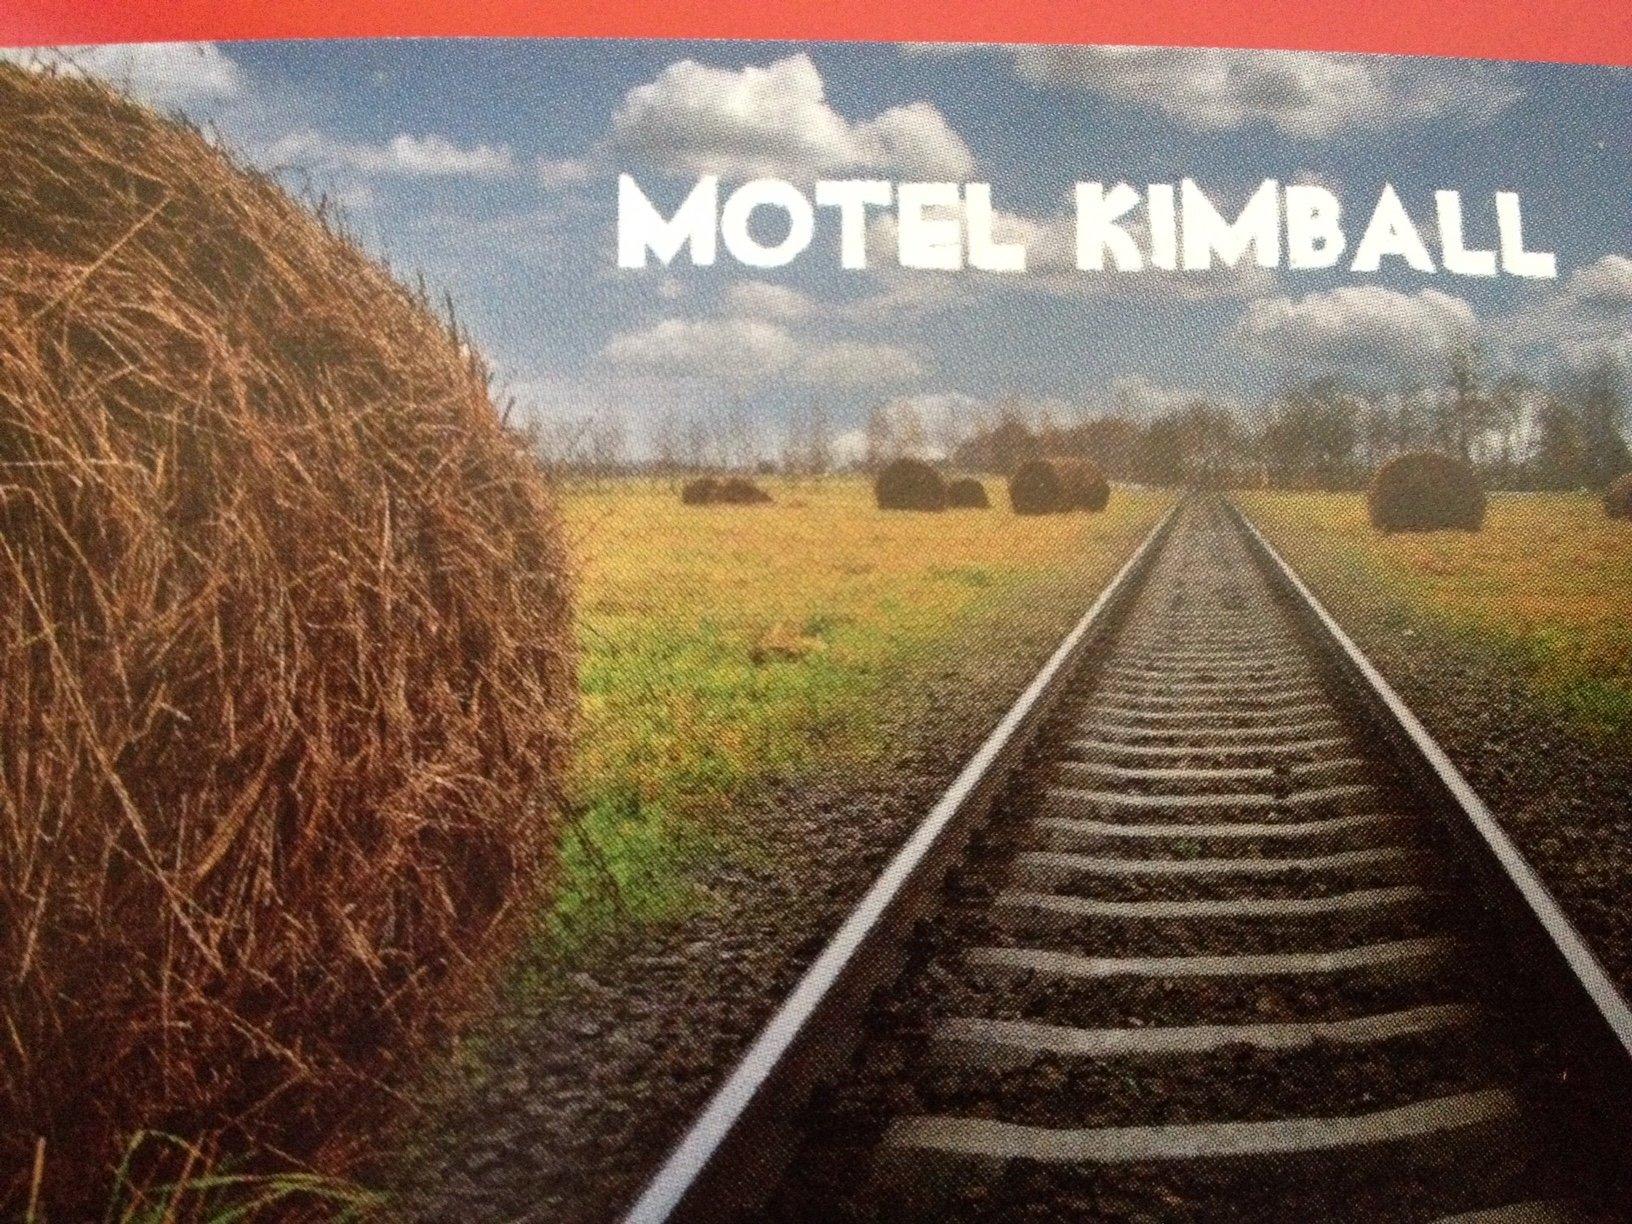 Motel Kimball